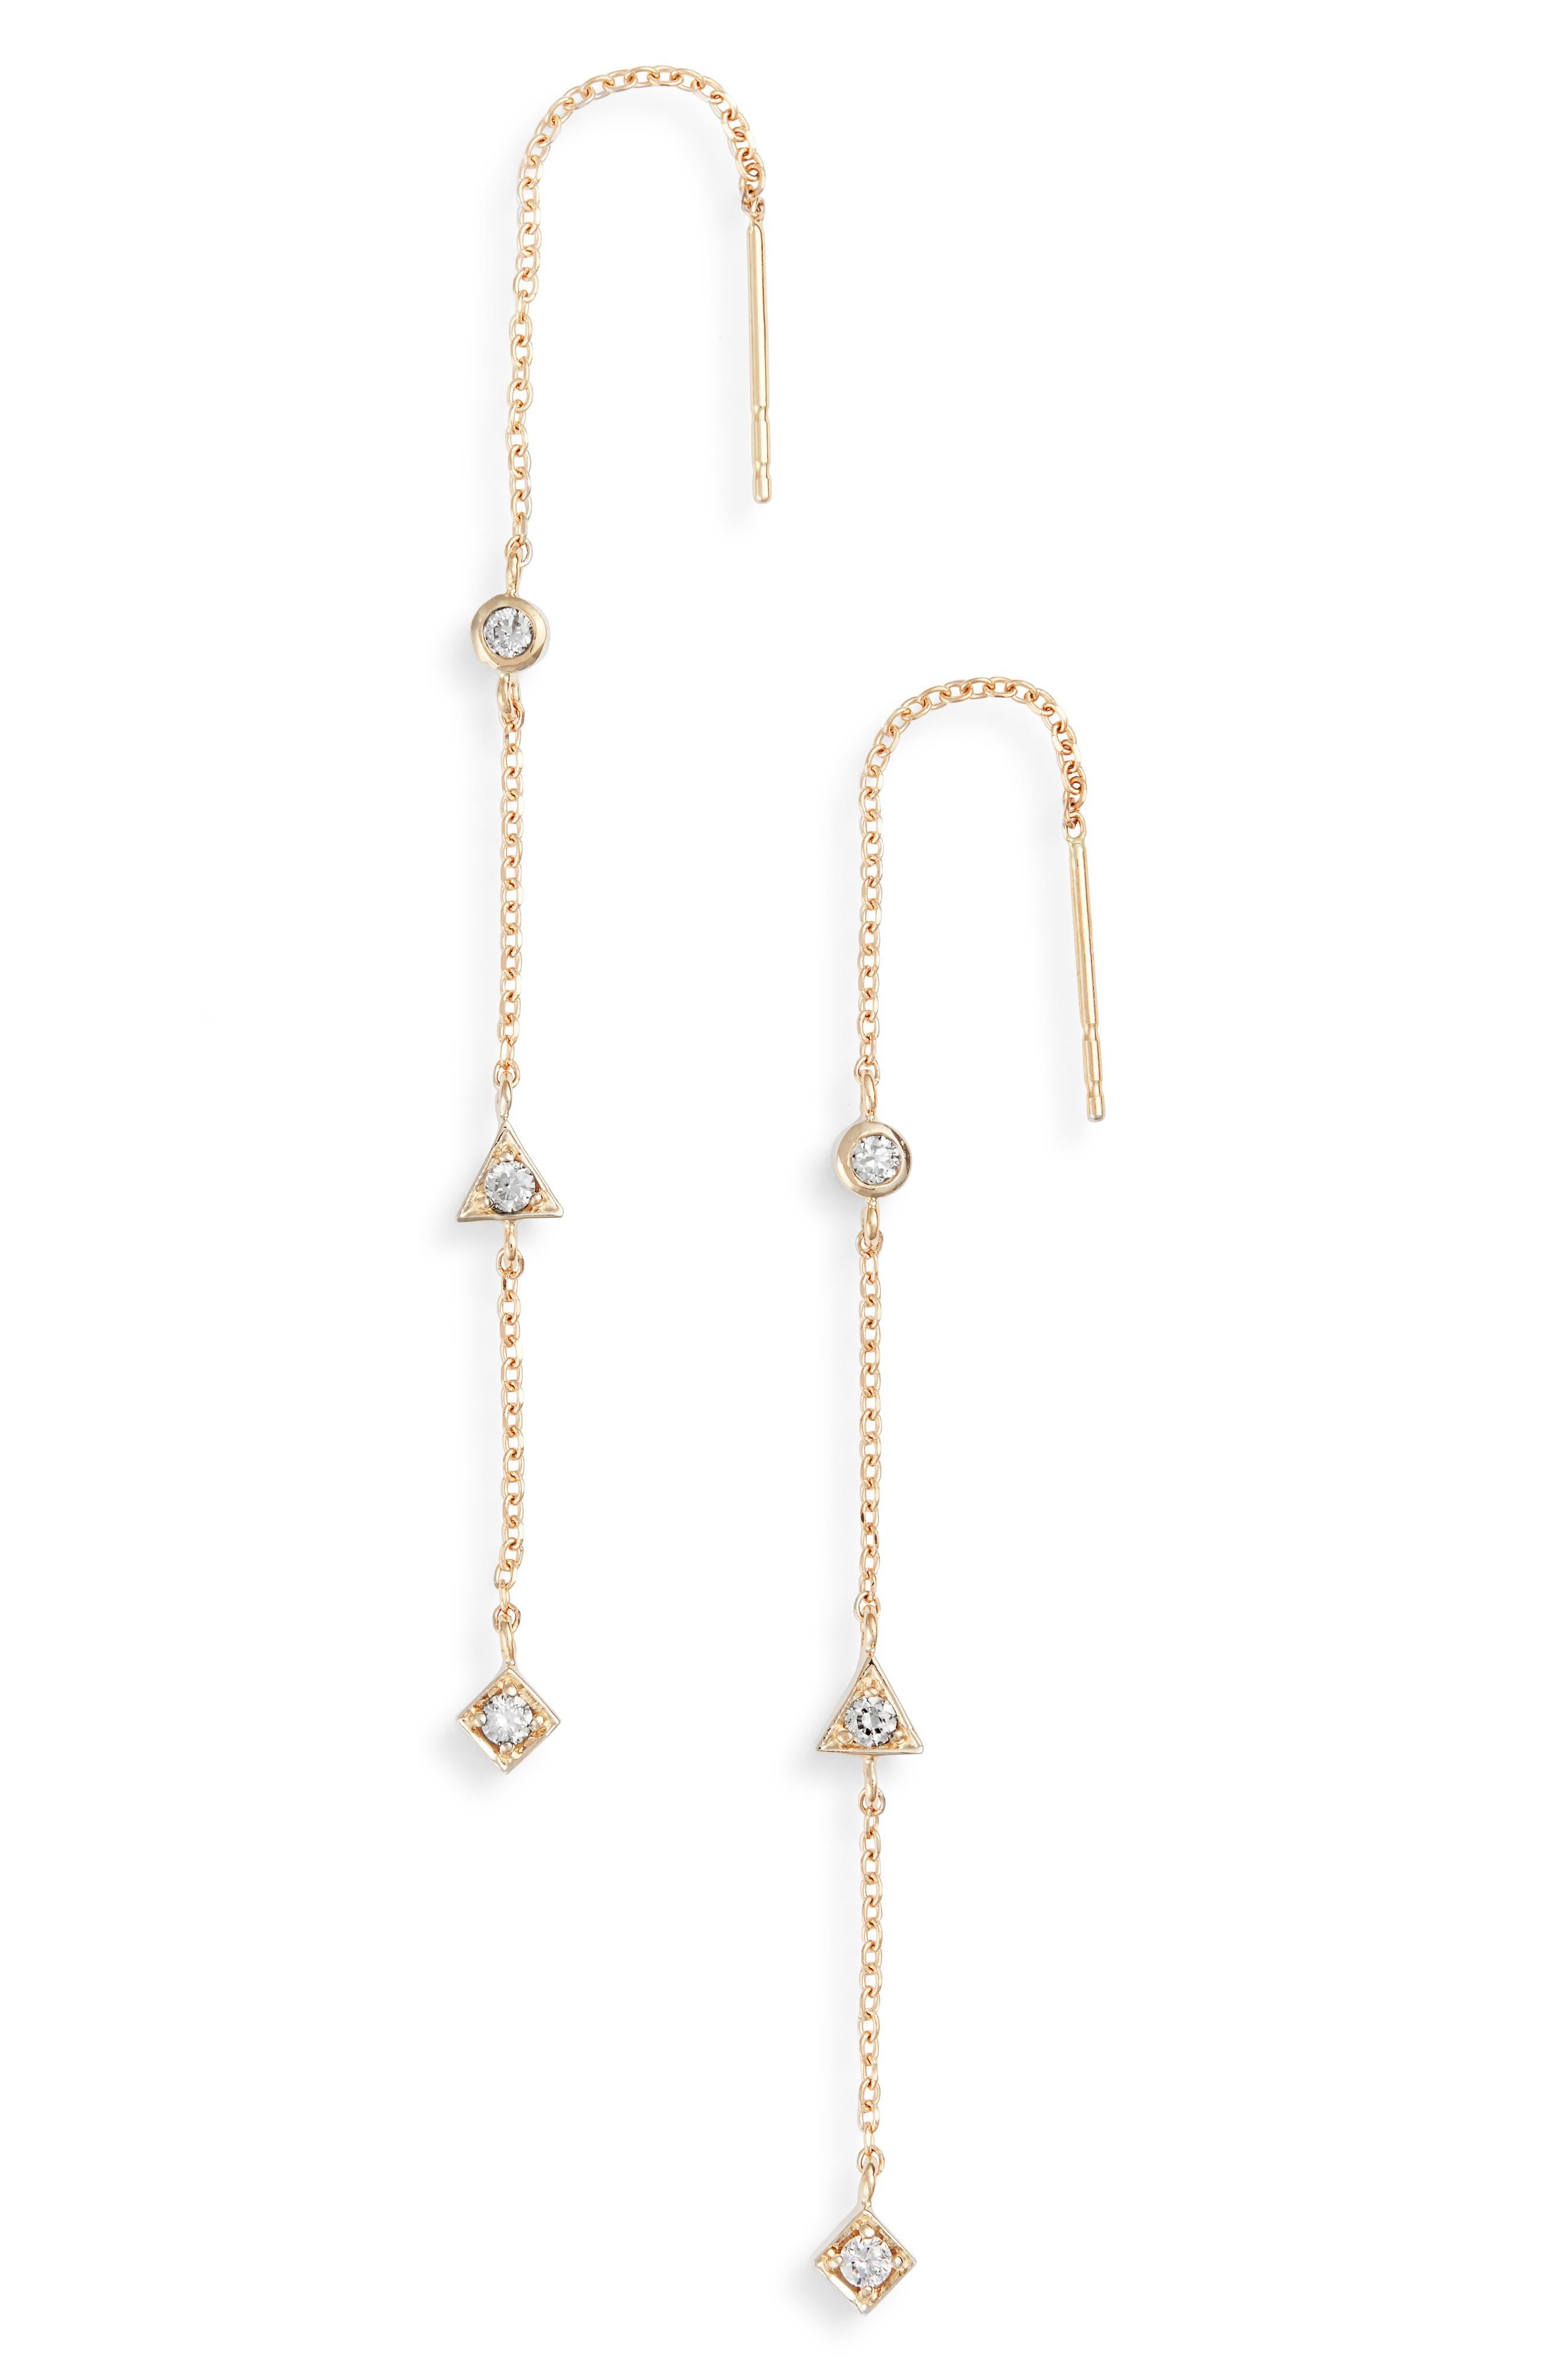 Cleo Diamond Linear Earrings,                         Main,                         color, GOLD